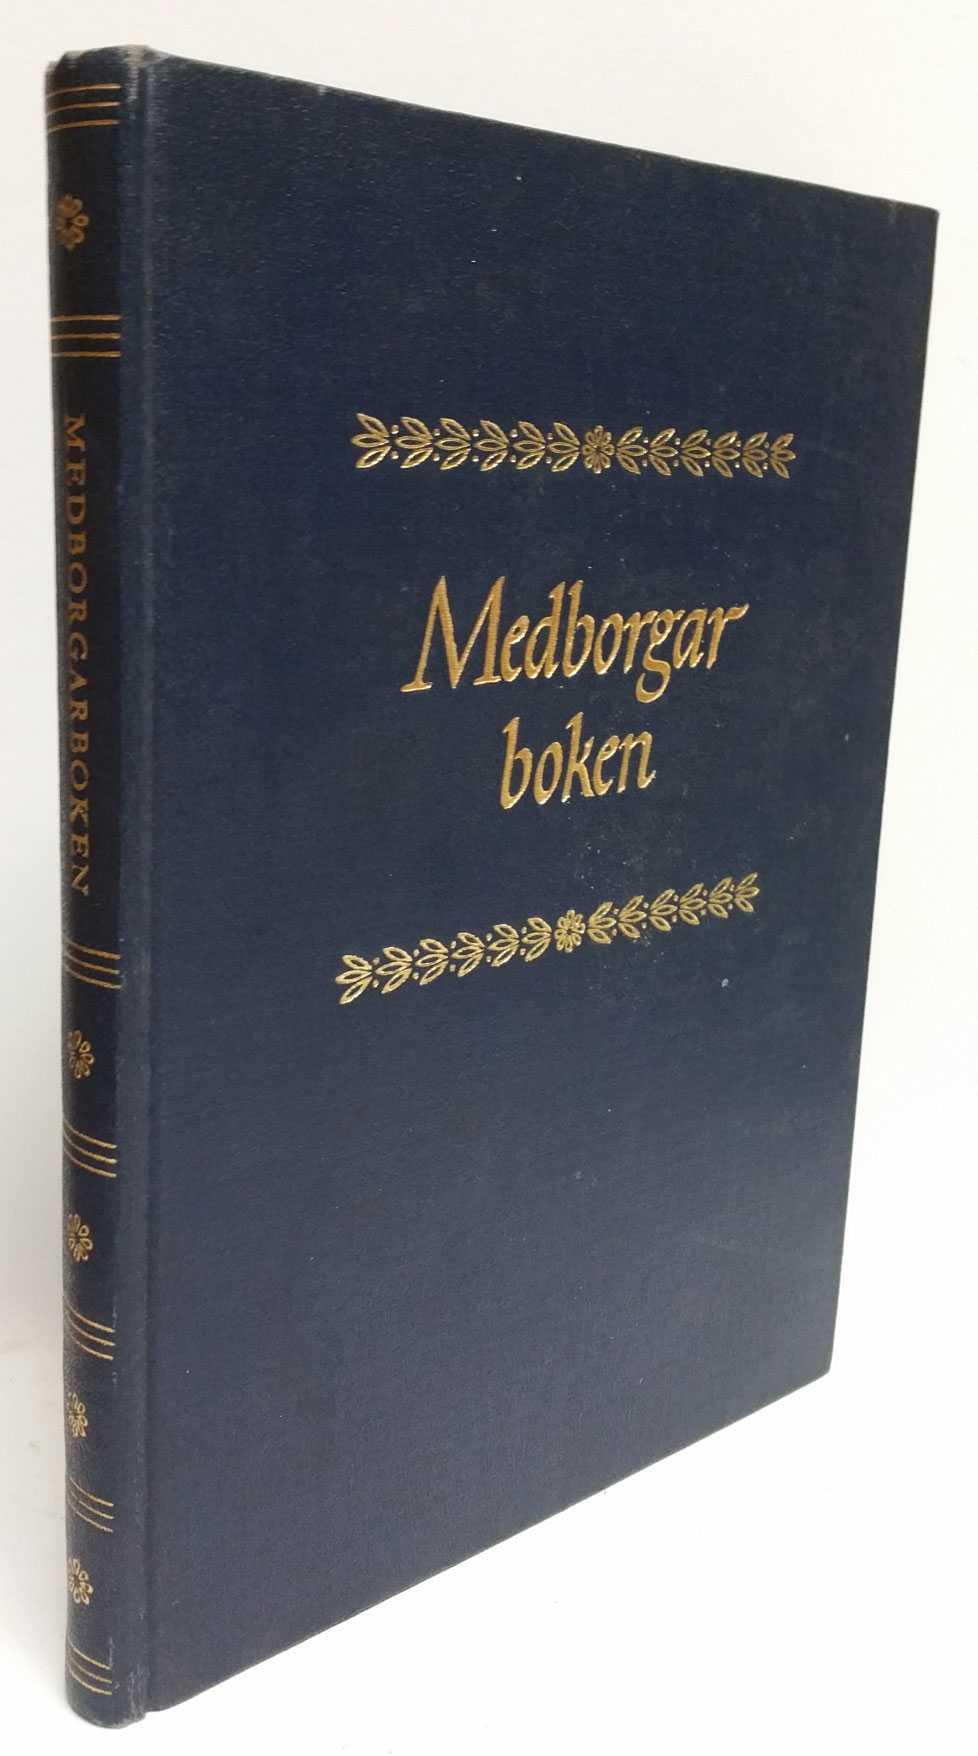 Medborgarboken, Sixten Larsson; Herman Stolpe